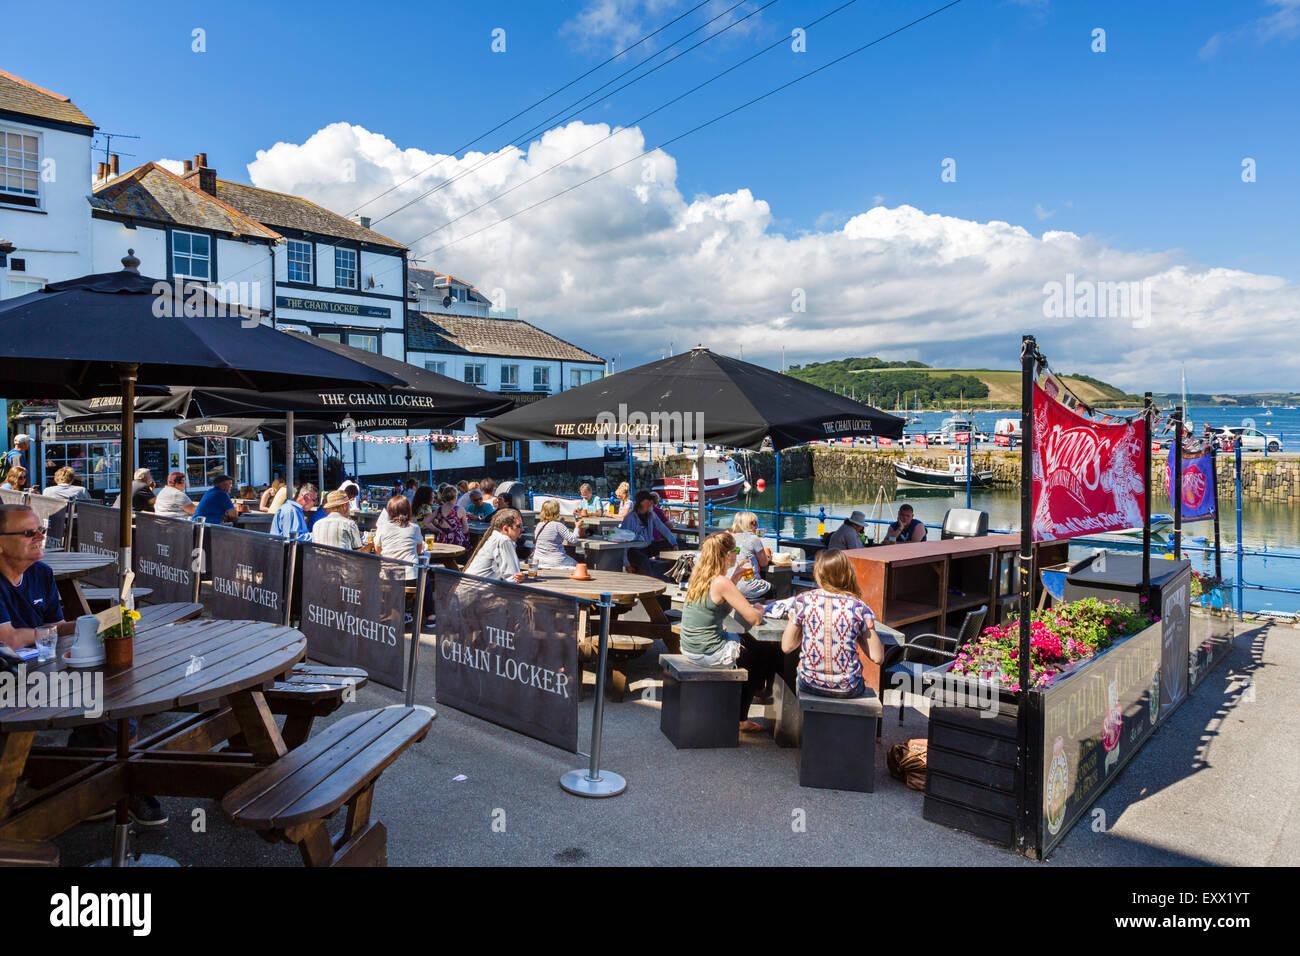 The Chain Locker pub on Custom House Quay, Falmouth, Cornwall, England, UK - Stock Image